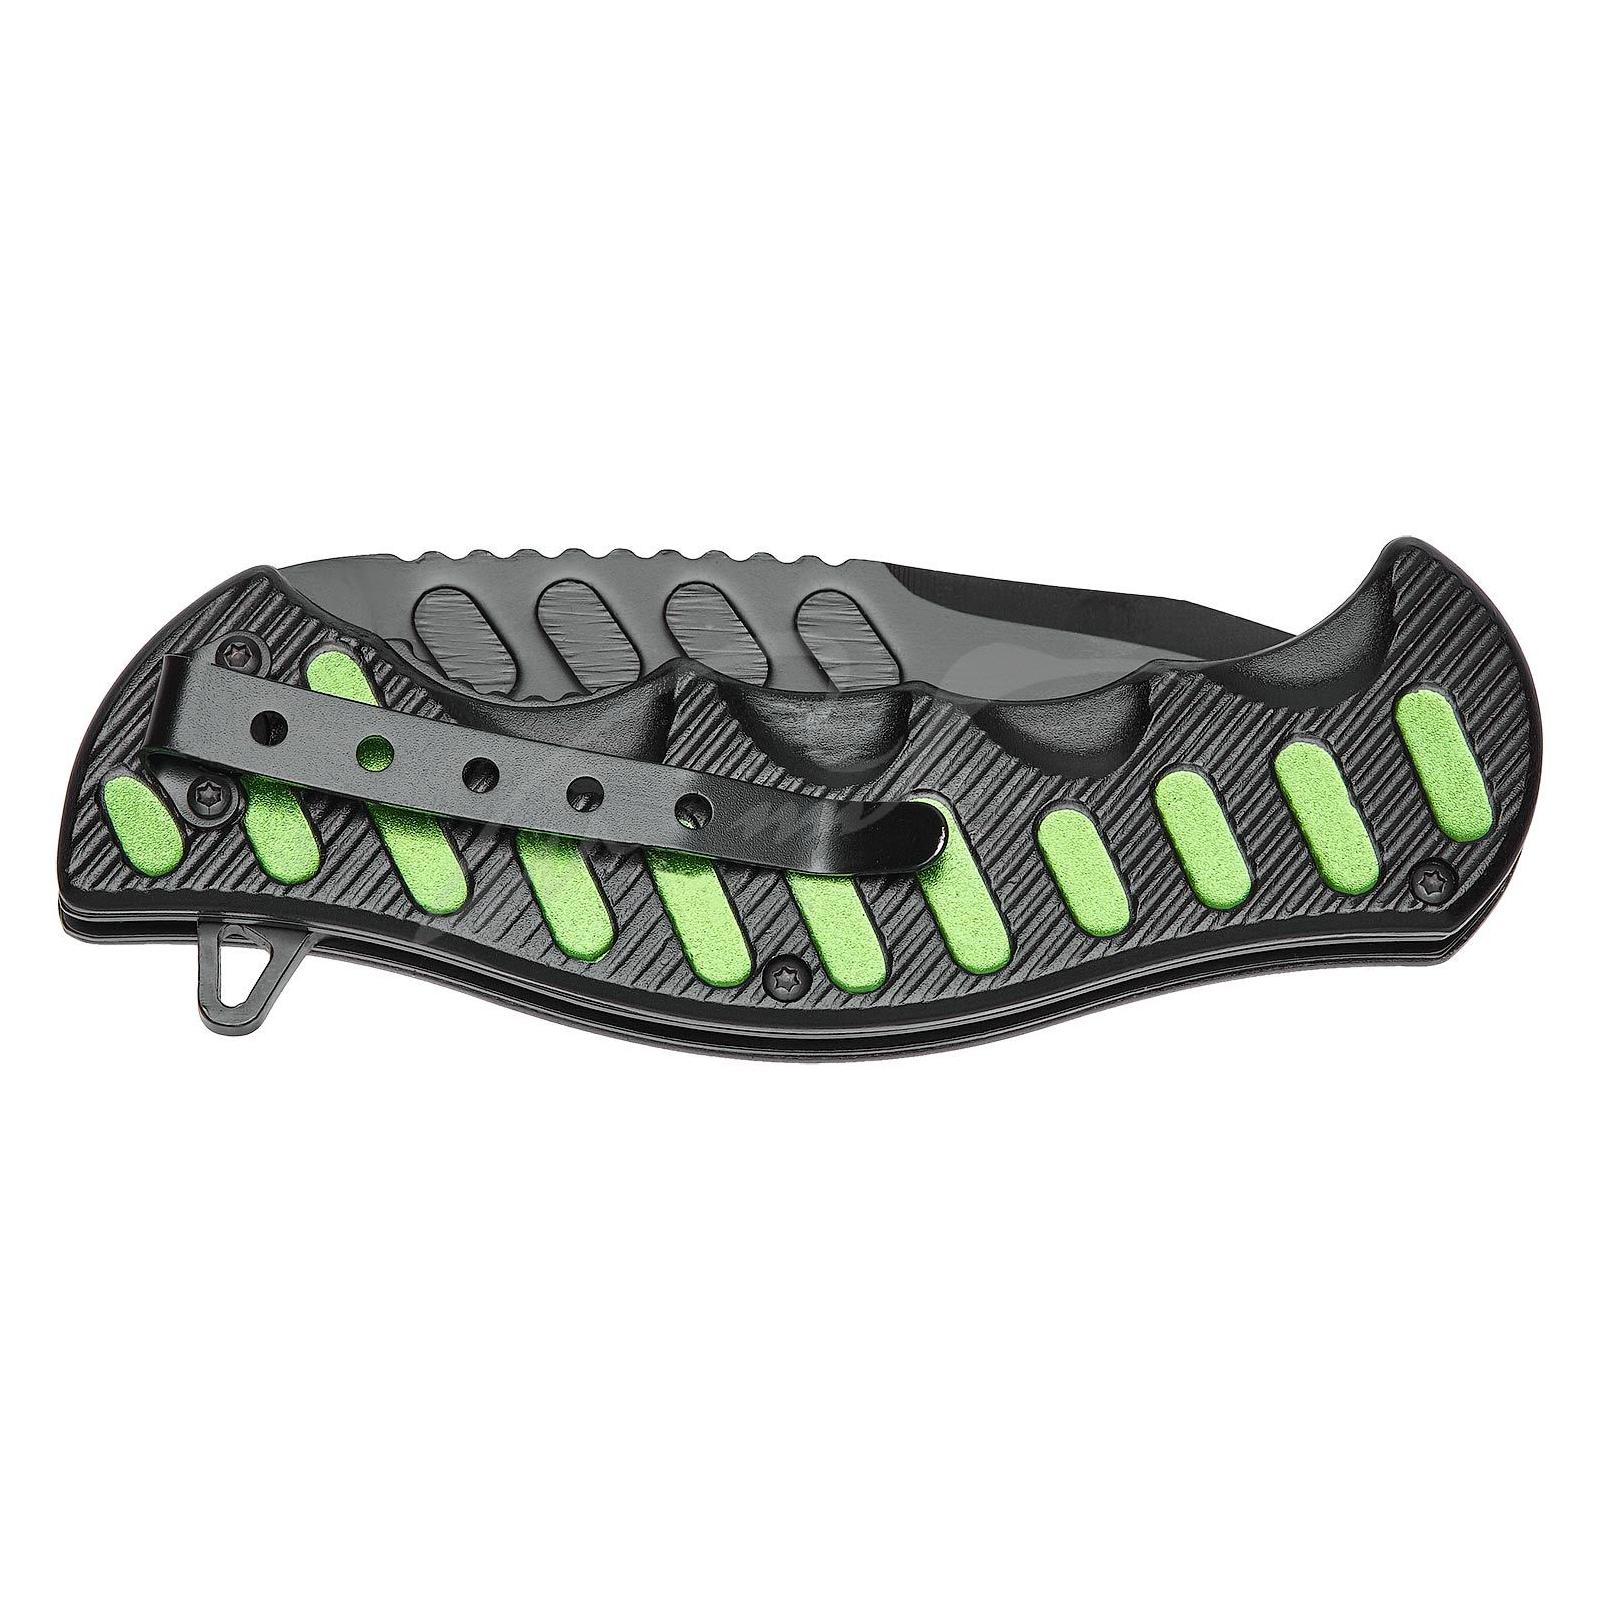 Нож Skif Plus Funster Black/Green (H-K2010053BGR) изображение 4